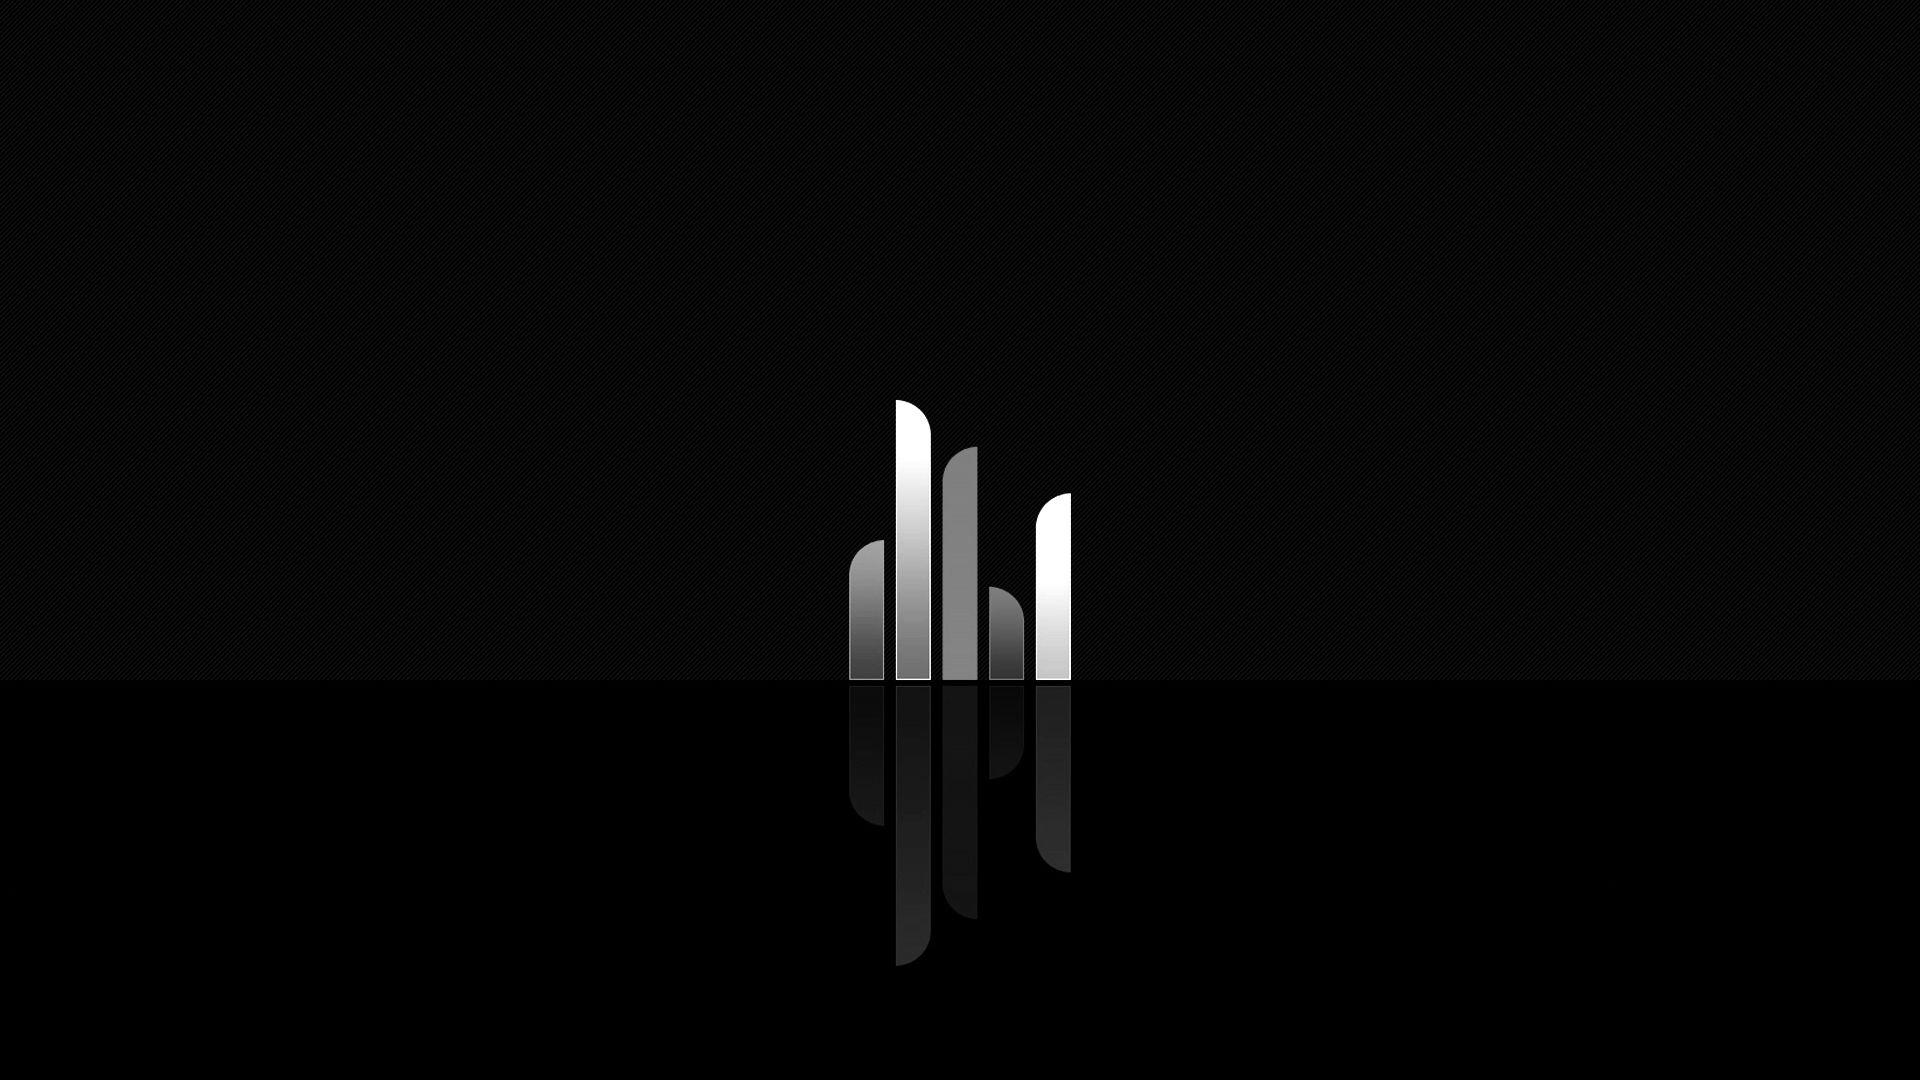 svart och vit bakgrunds HD